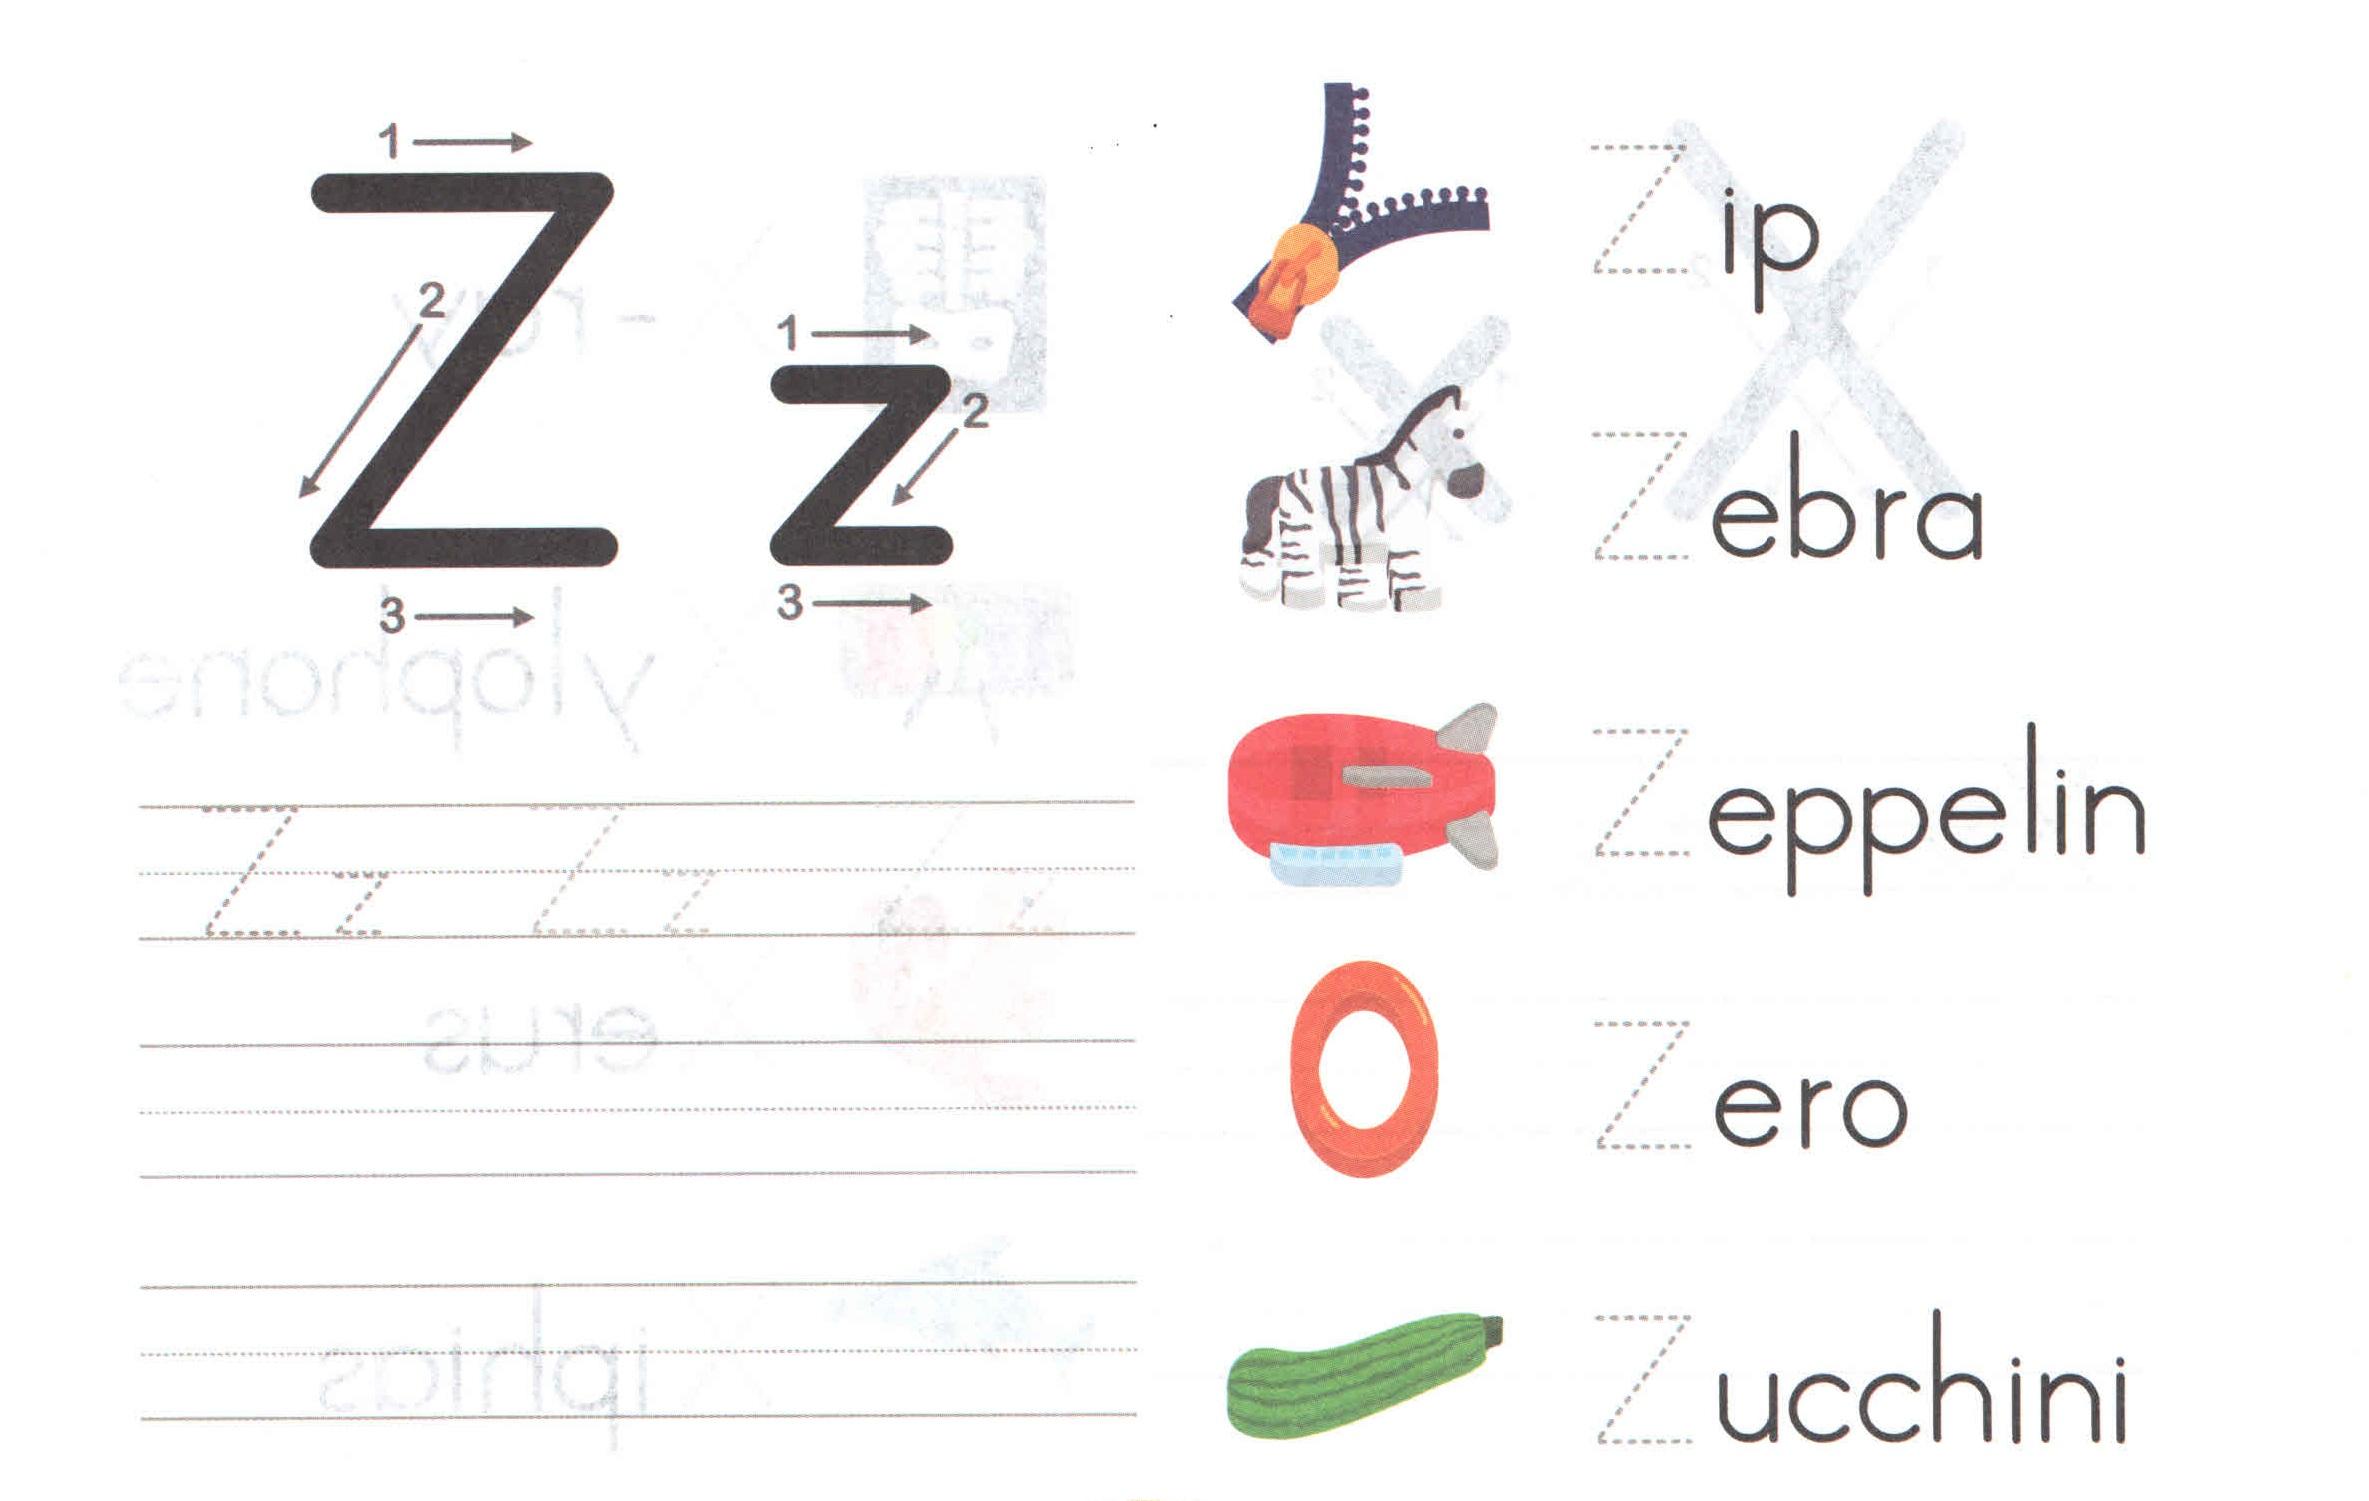 alphabet-capital-and-small-letter-Z-z-worksheet-for-kids ...